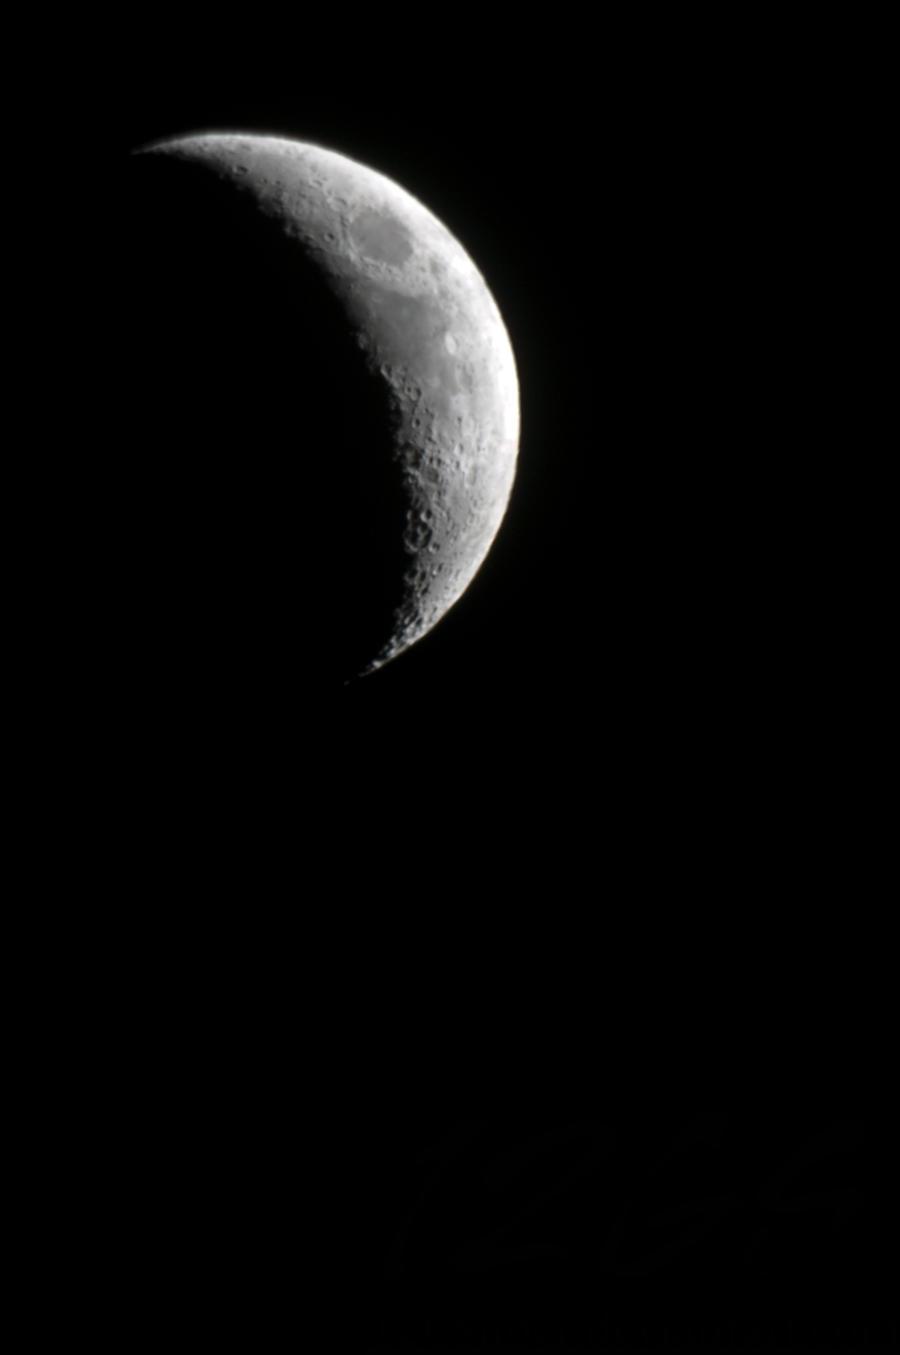 Moon by 12GSuper